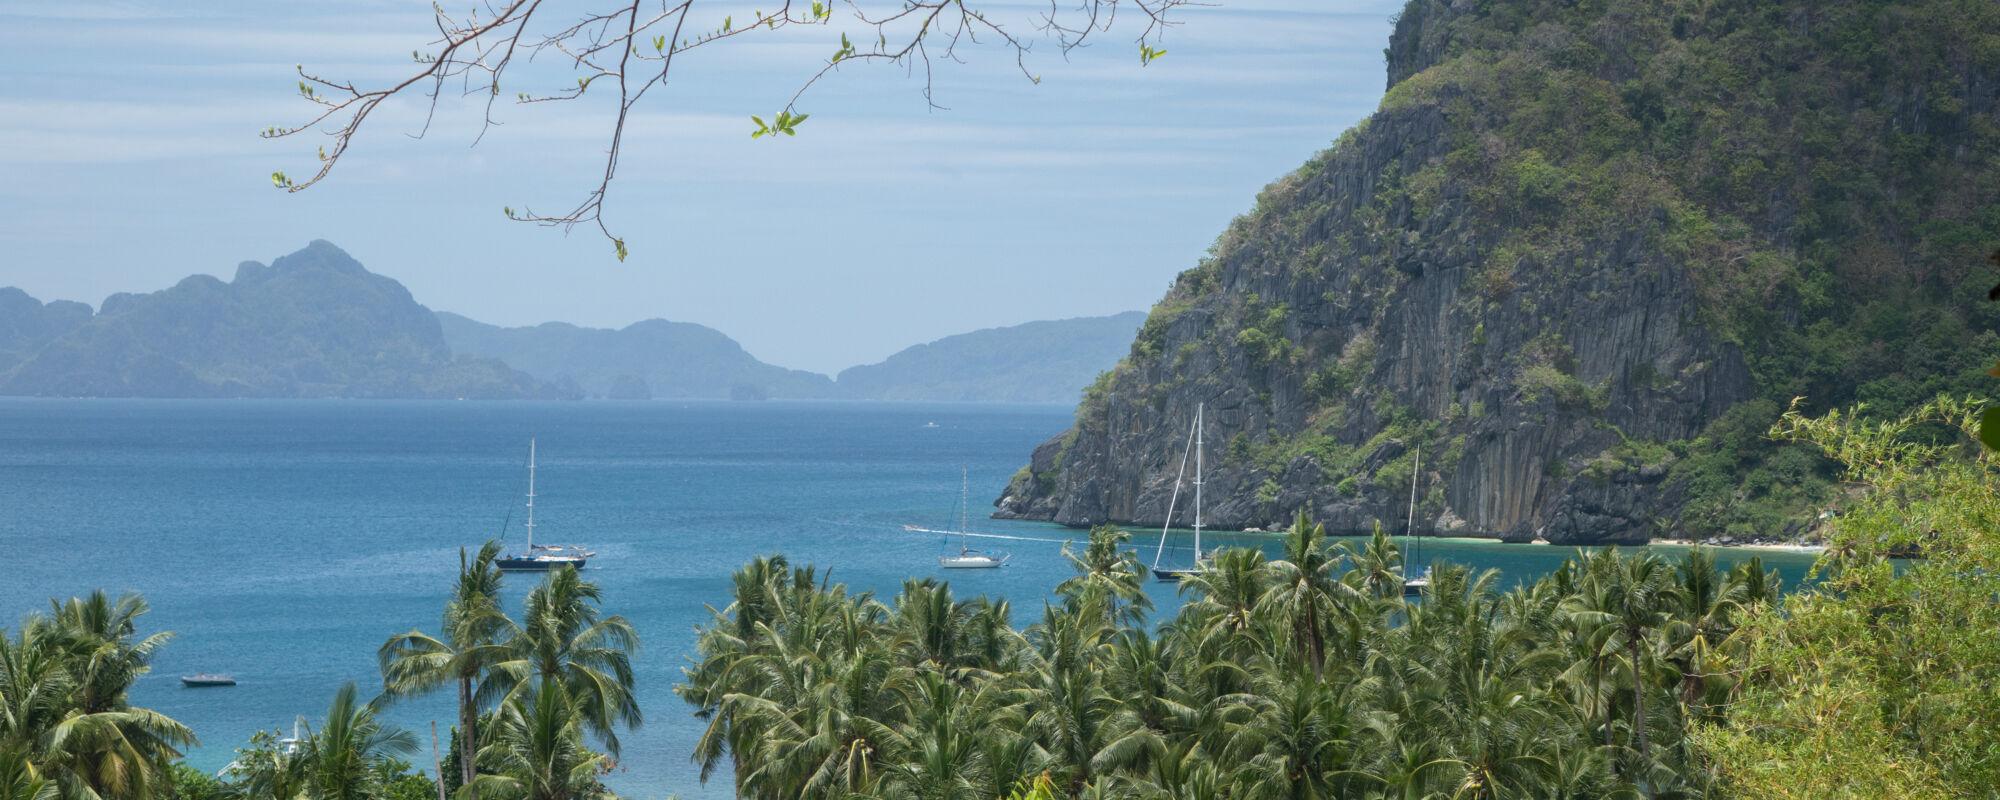 <br> Philippines